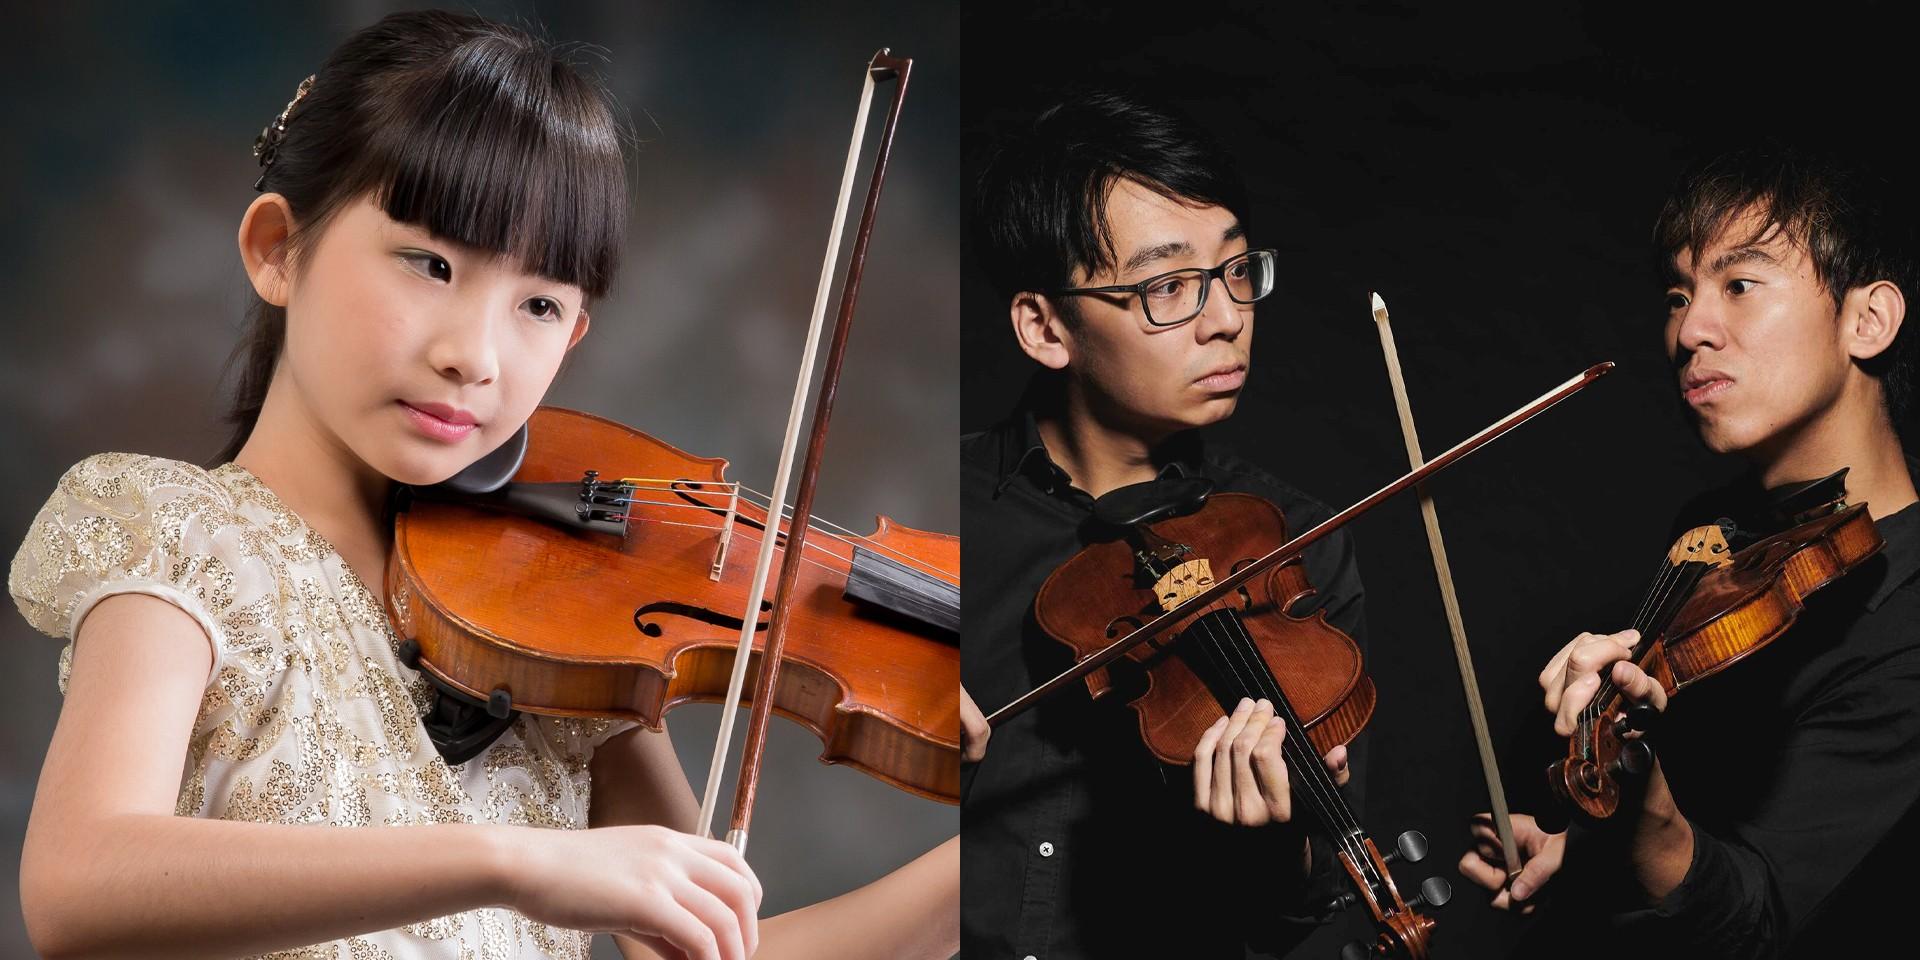 13-year-old violin prodigy Chloe Chua roasts TwoSet Violin – watch